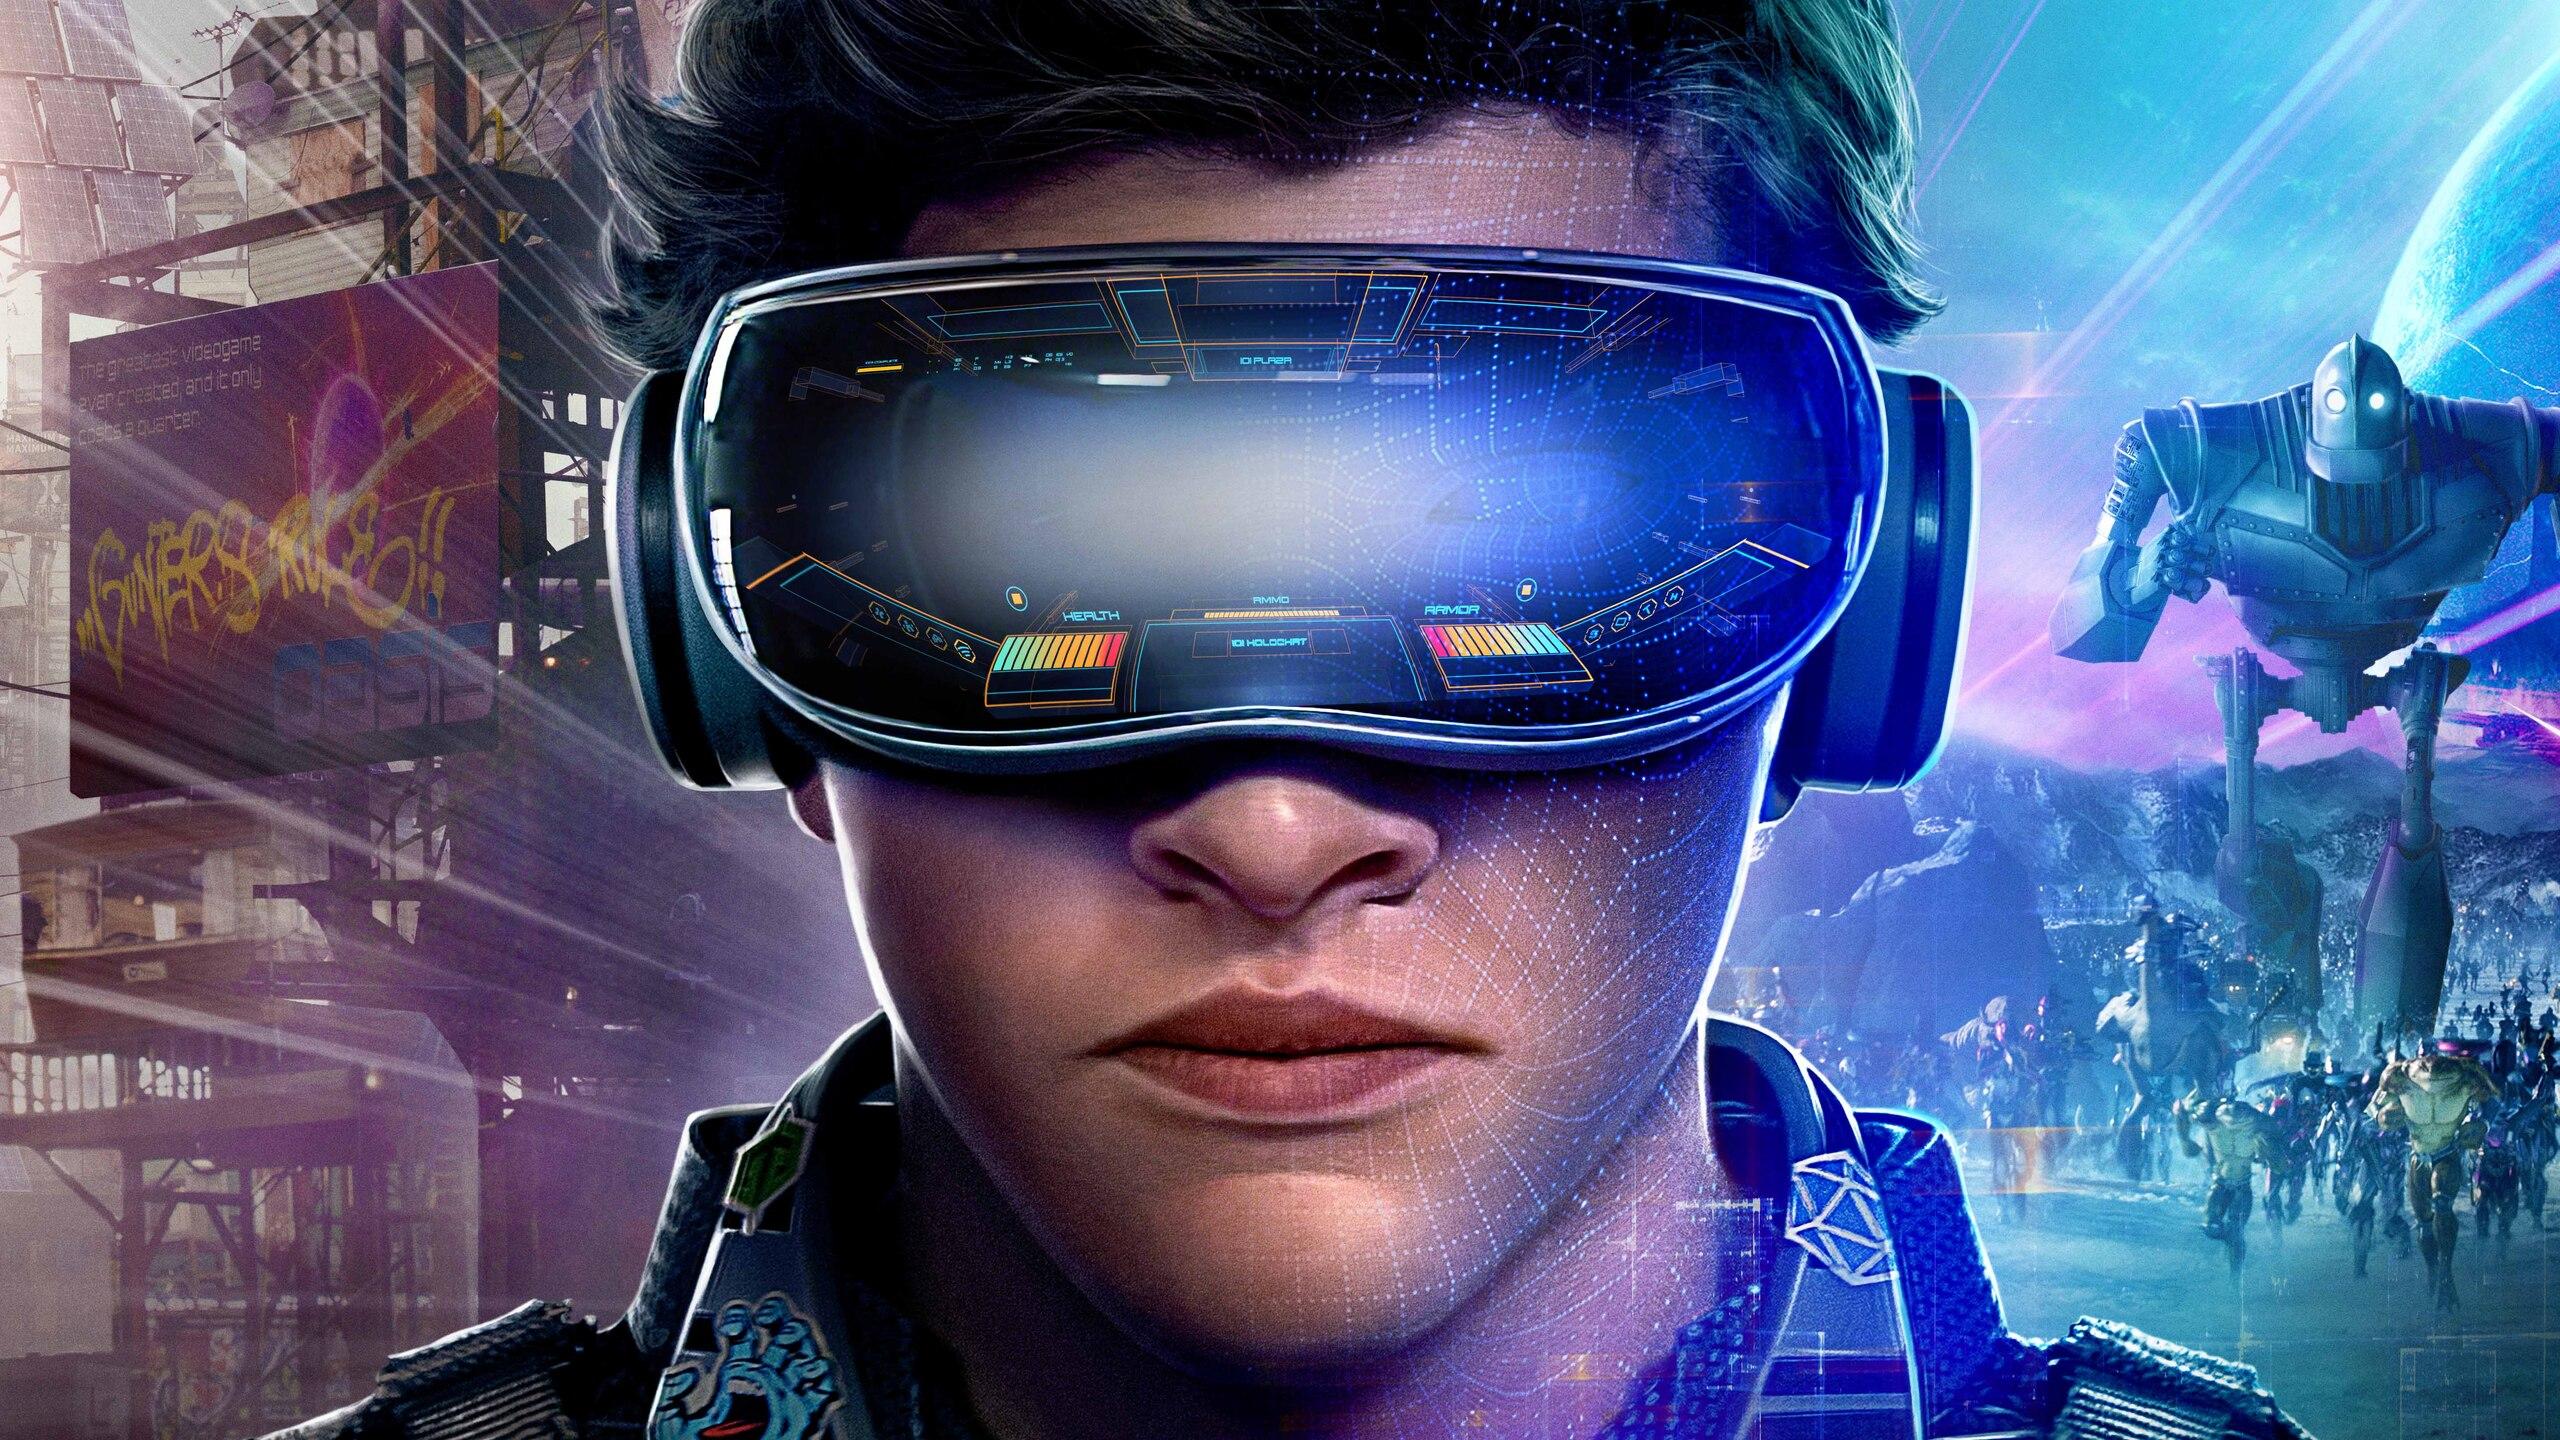 [Vf ReGarder] Ready Player One 2018 Streaming VF HD